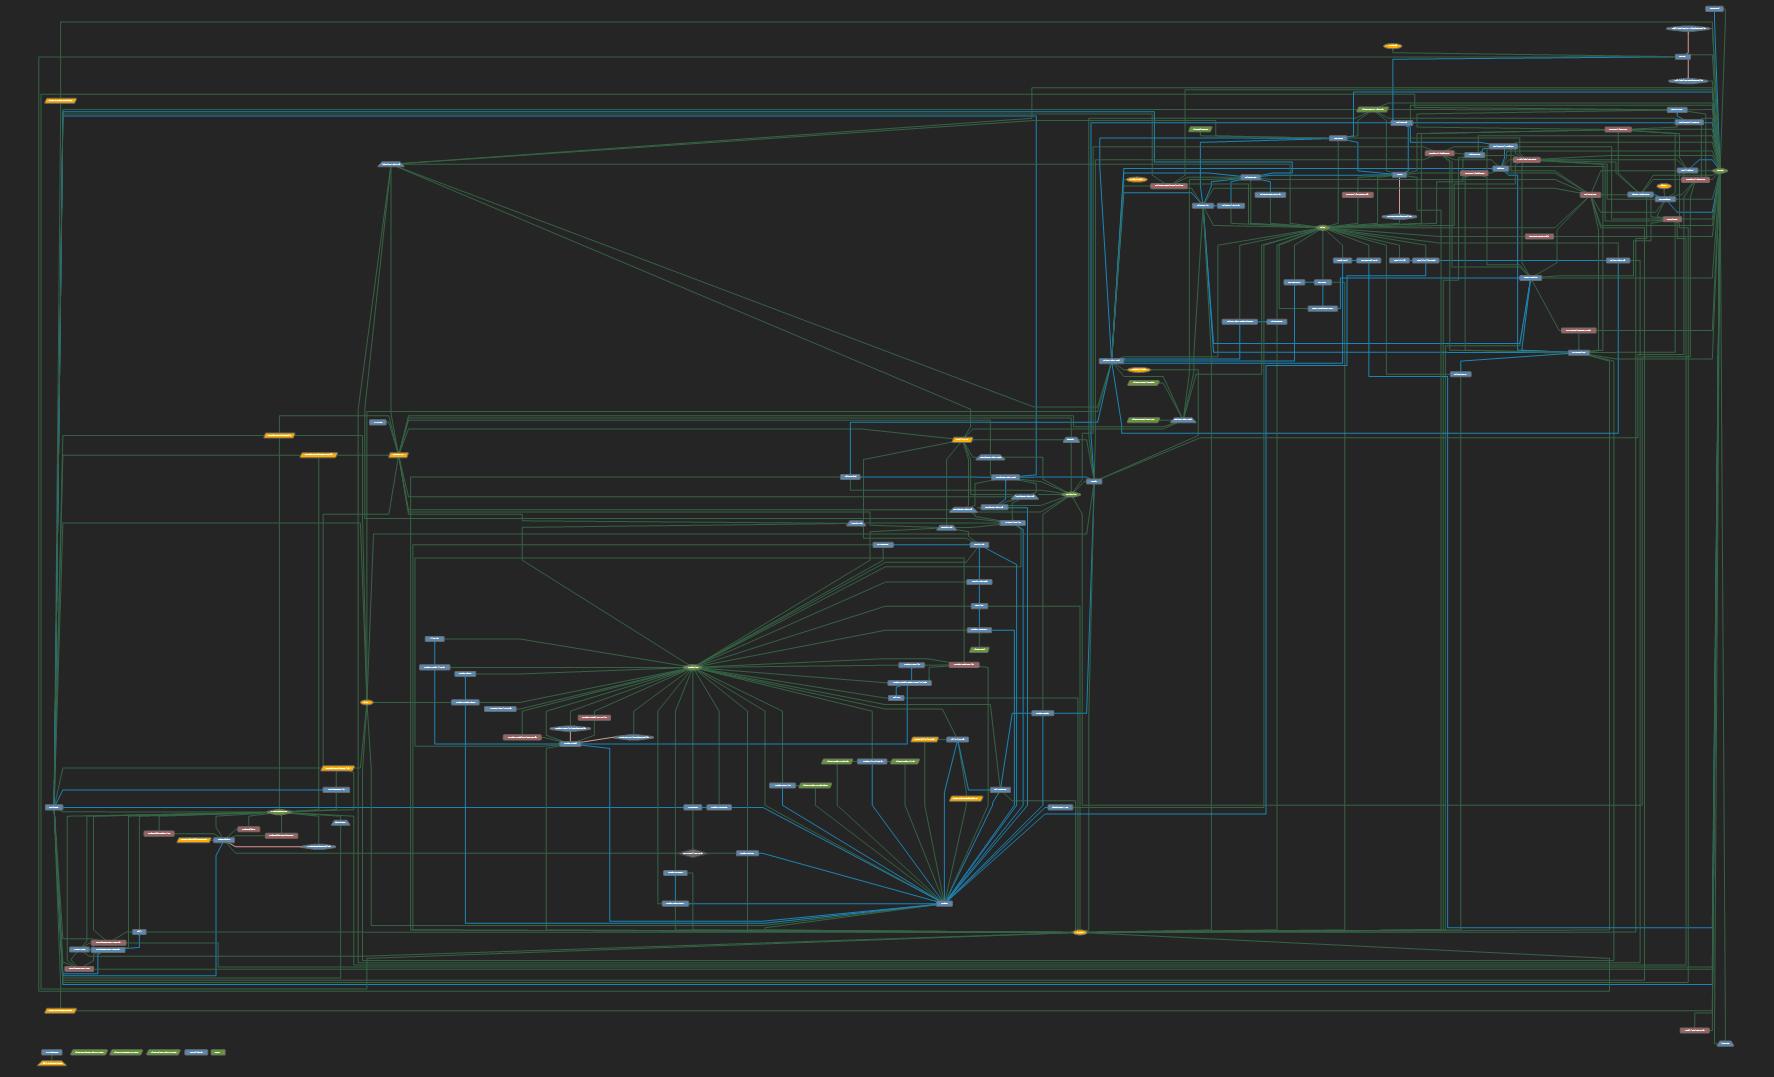 adventureworks 2012 diagram wiring for 220 volt plug microsoft sql server historical sample database tour